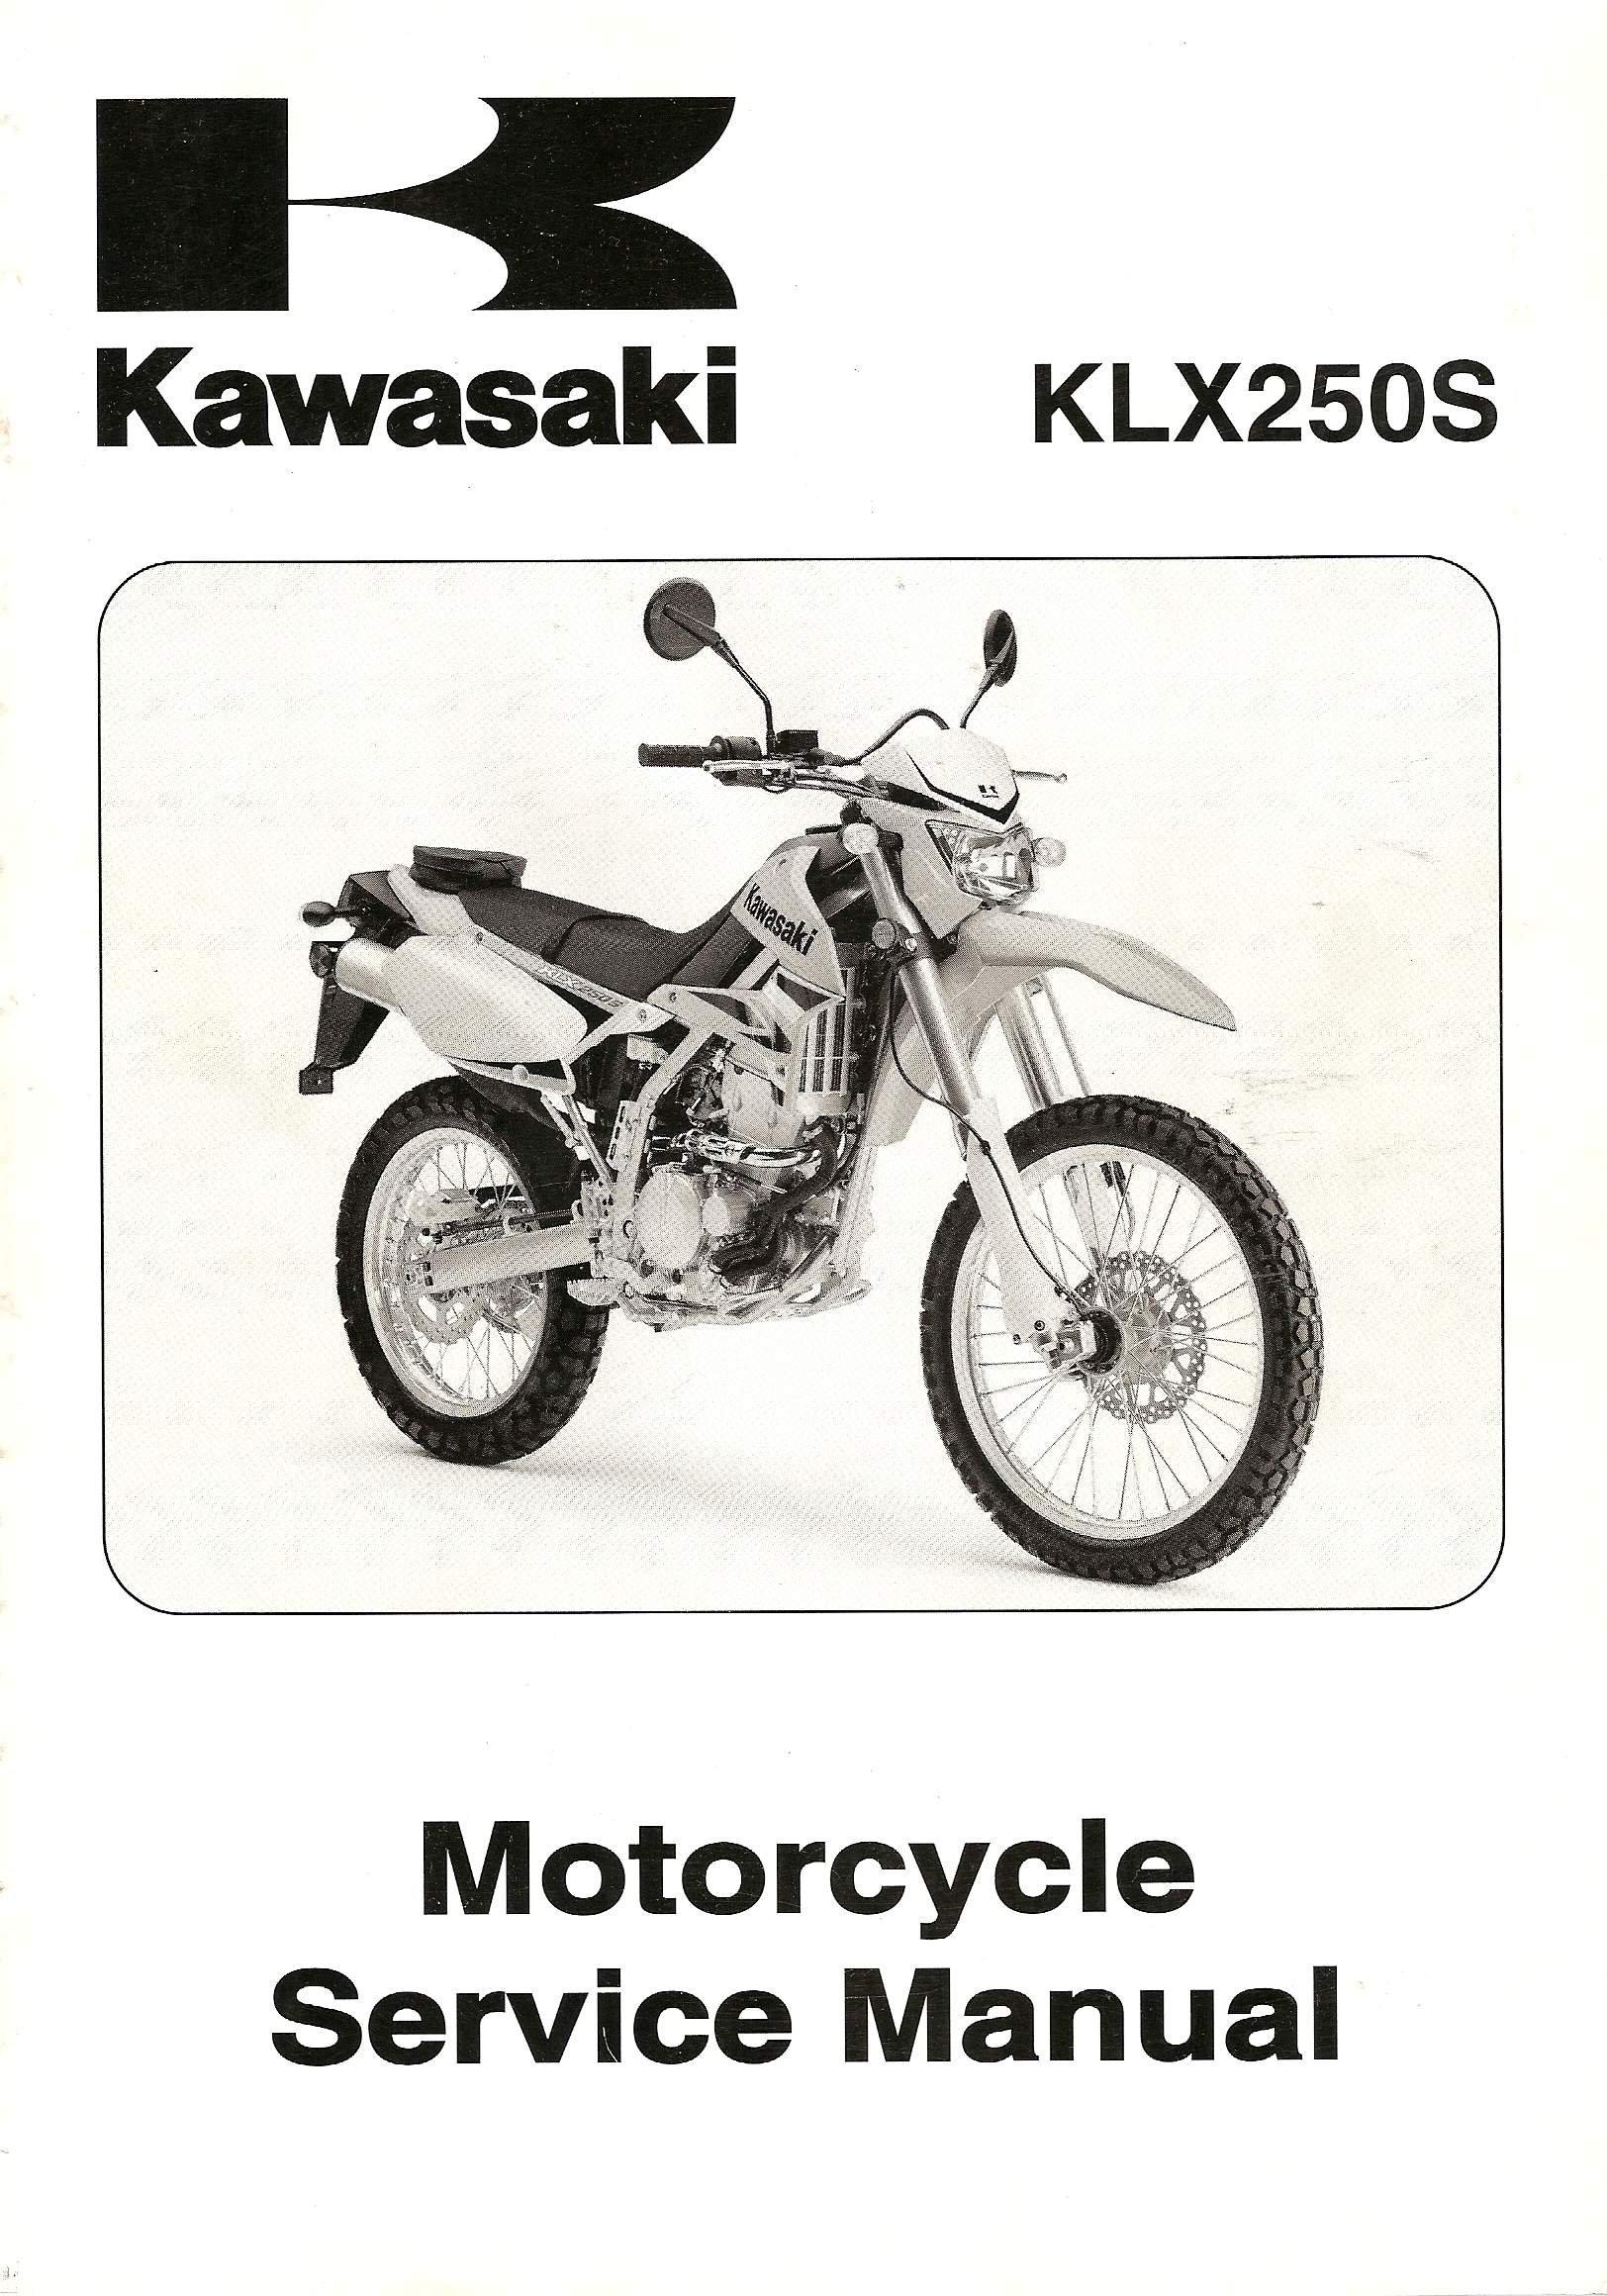 Kawasaki klx250s / klx250sf service manual repair 2009-2014 klx250.